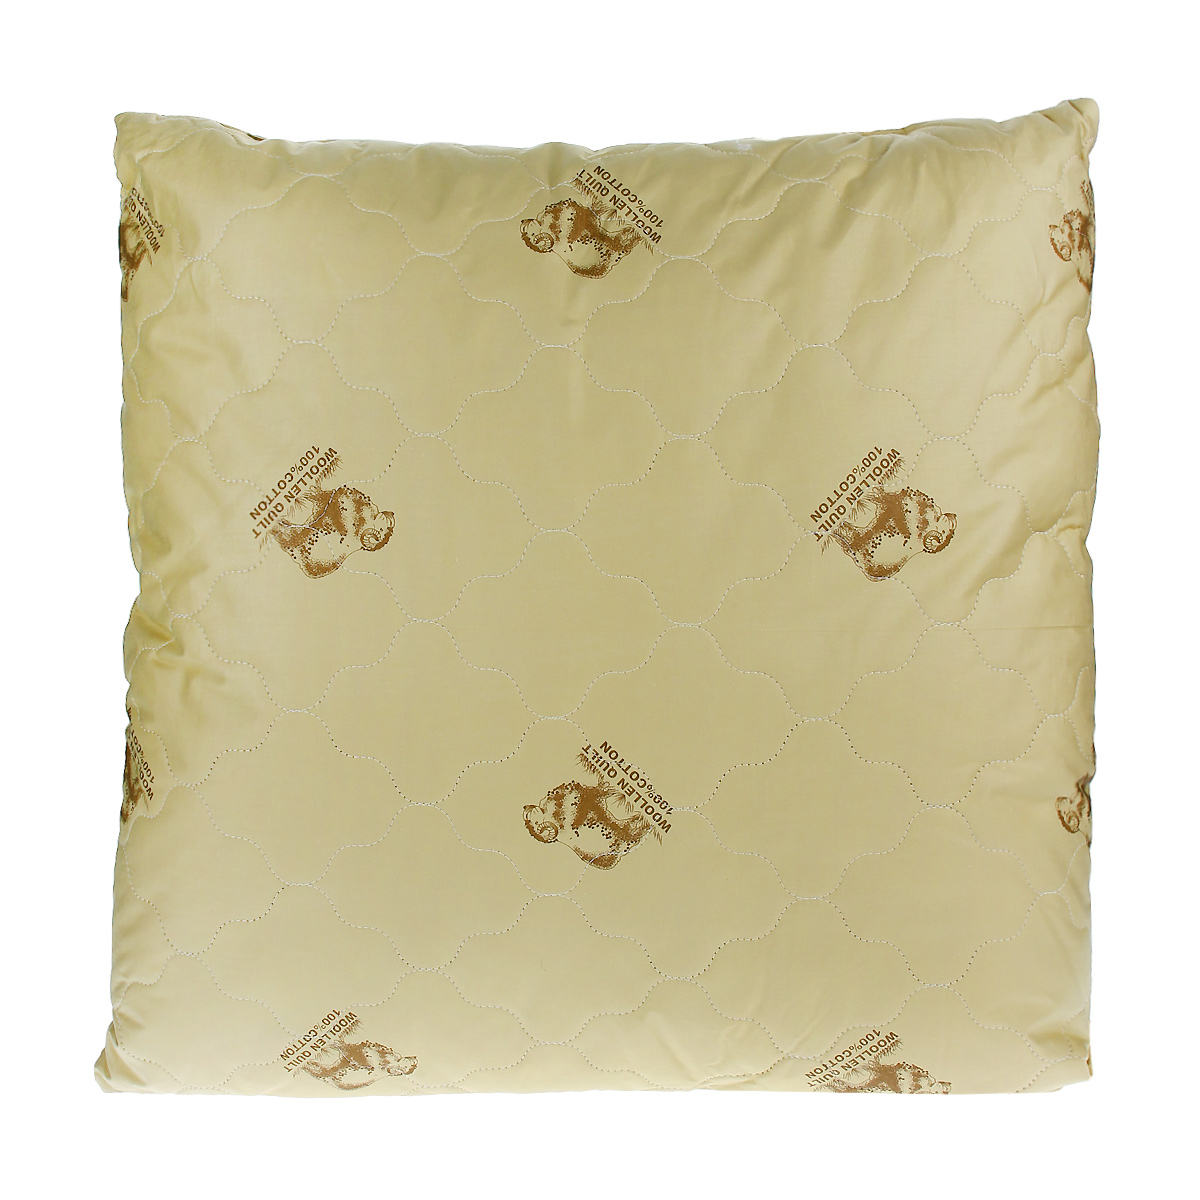 Подушка Овечка, цвет: темно-бежевый, 68 х 68 см2908-68-07темно-бежевый